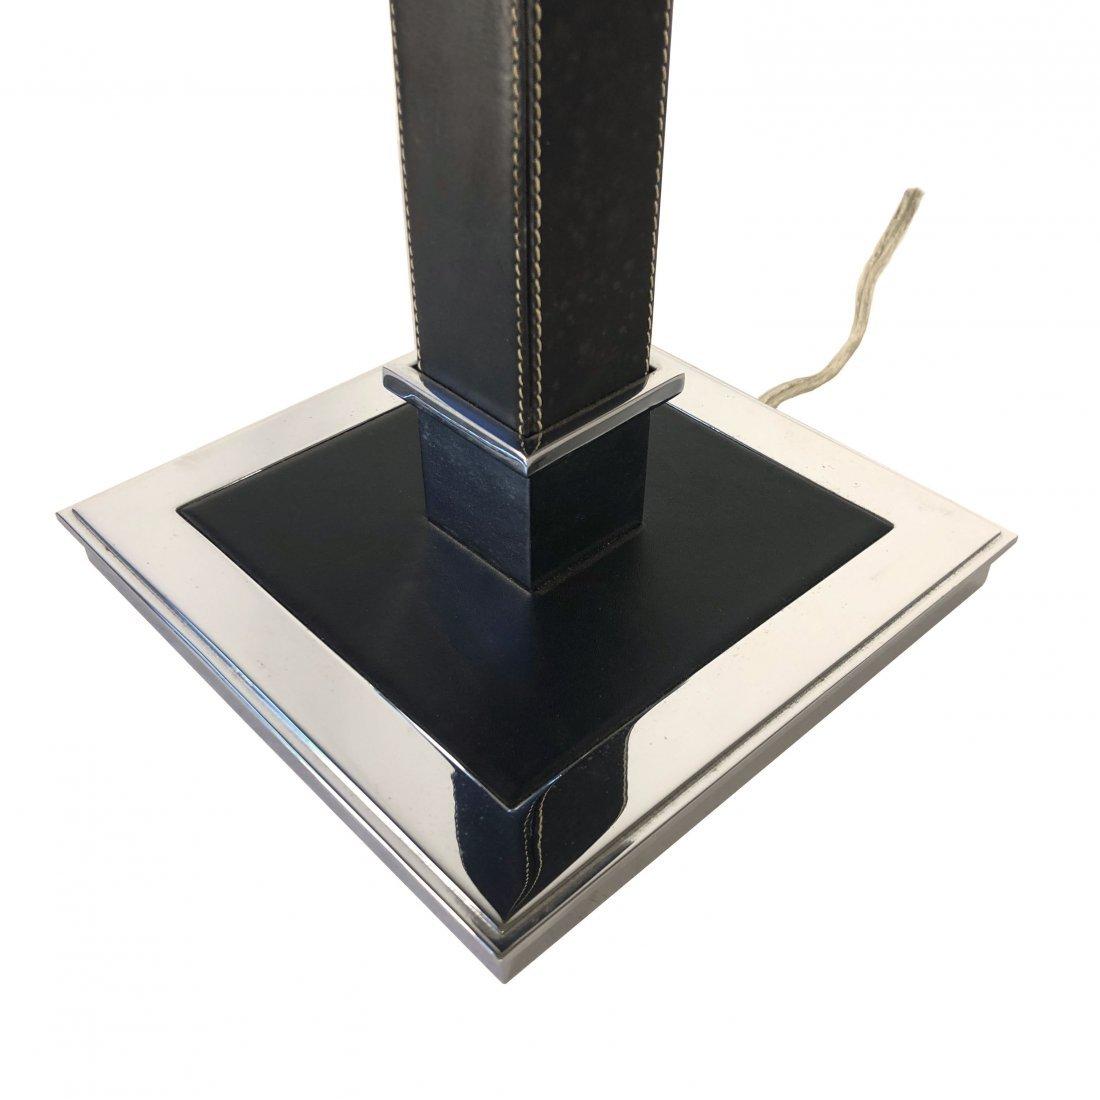 Ralph Lauren Polished Nickel Black Leather Table Lamp - 7